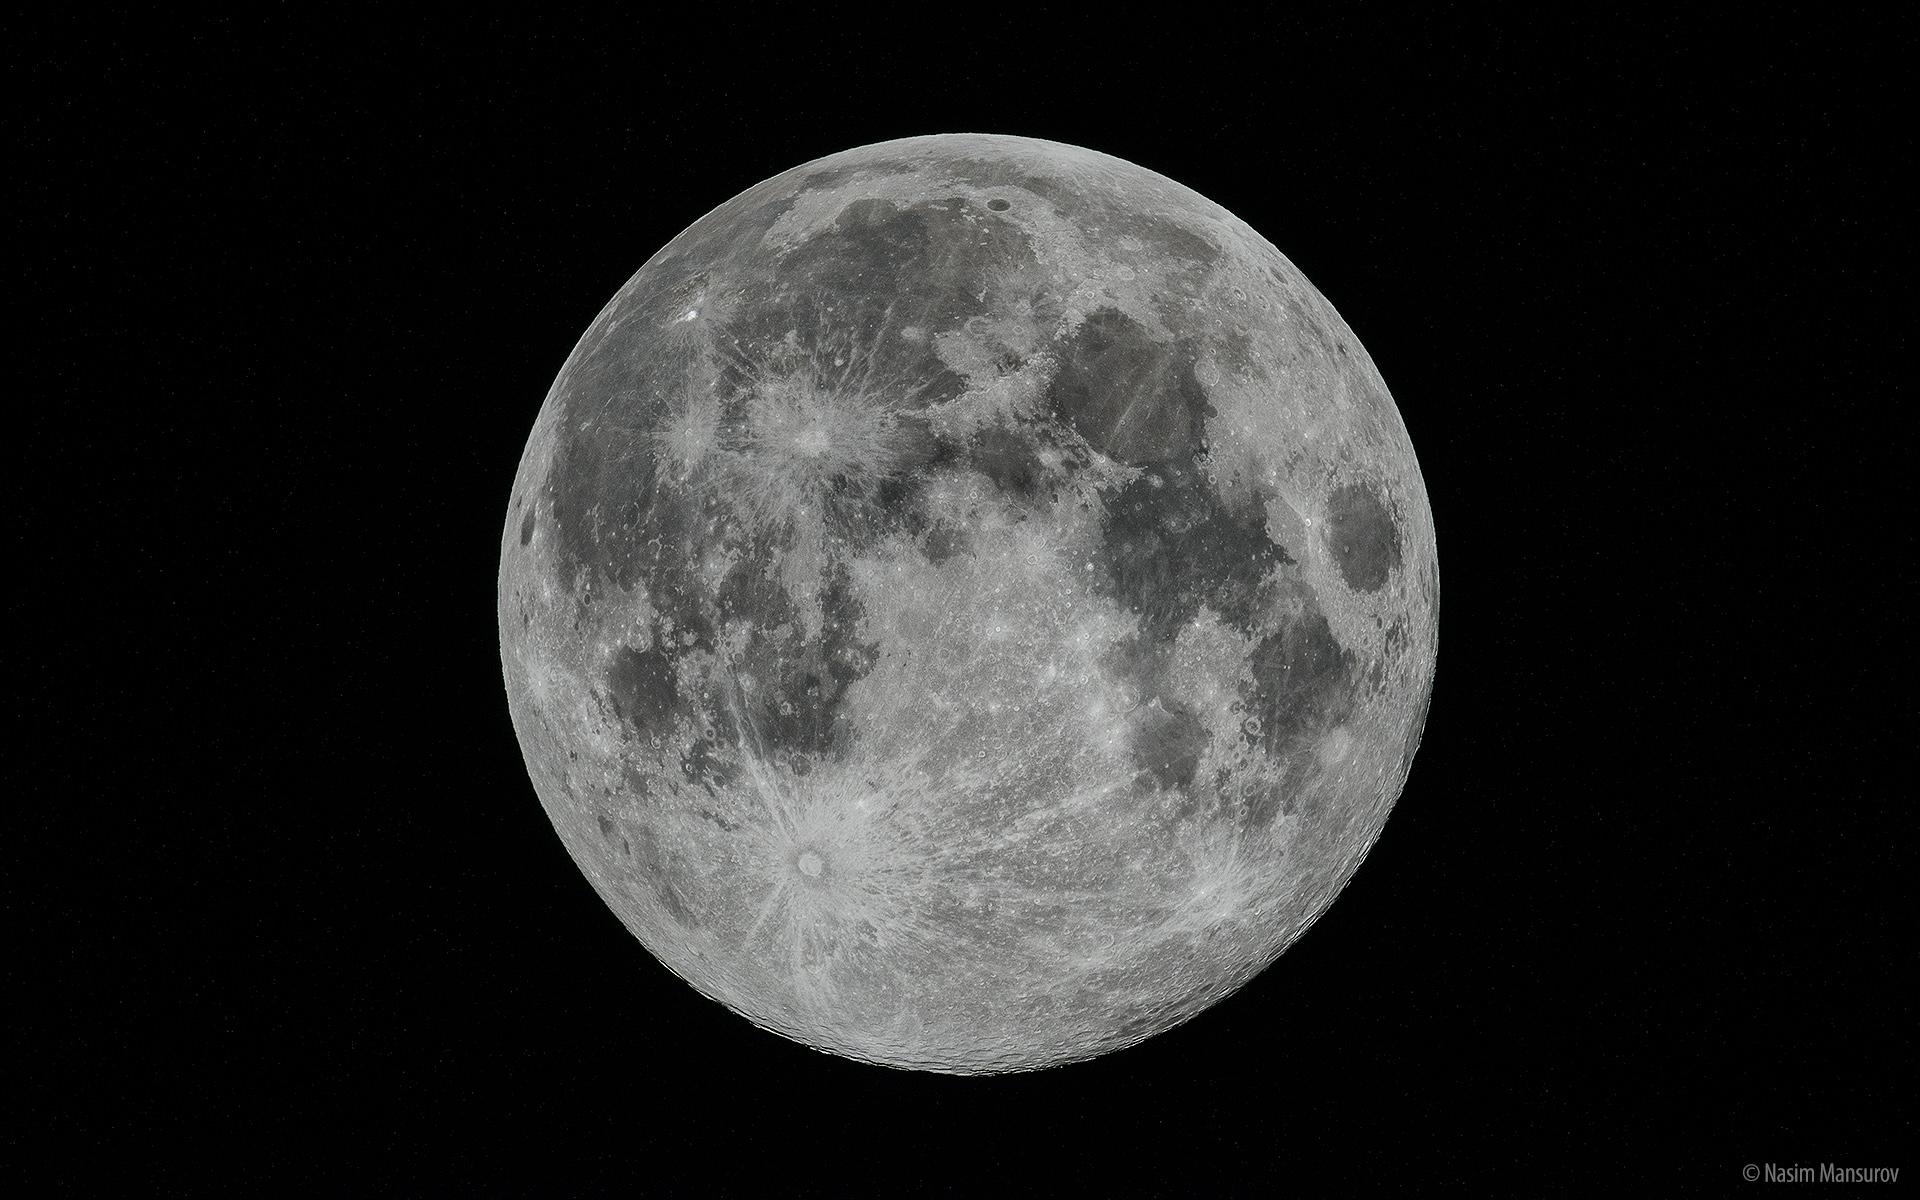 The Full Moon Wallpaper